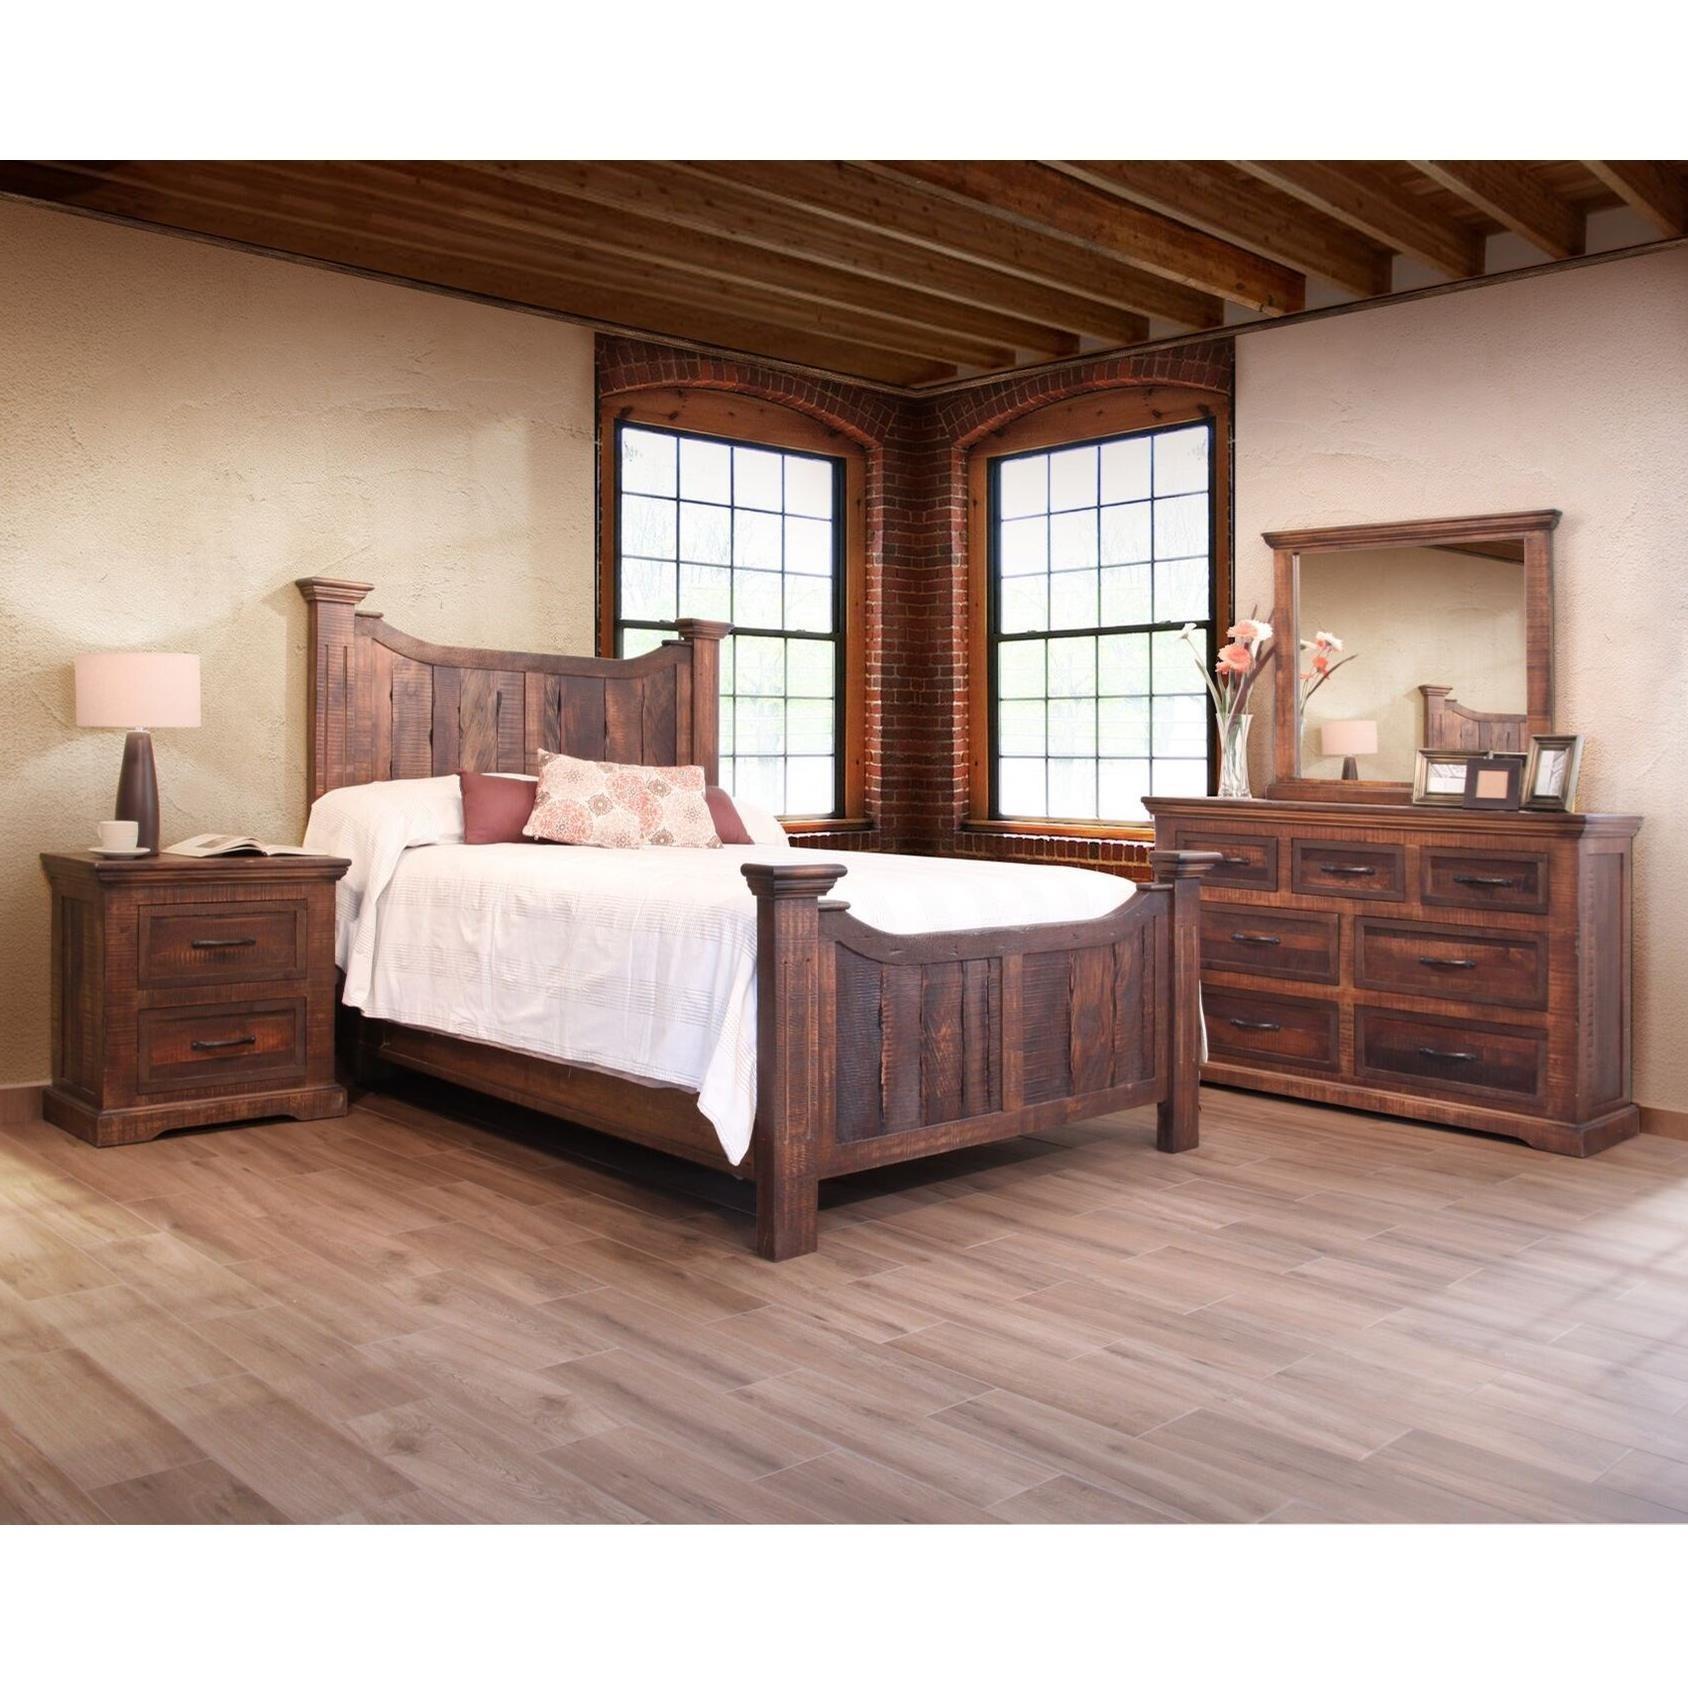 International furniture direct madeira queen bedroom group for Bedroom groups